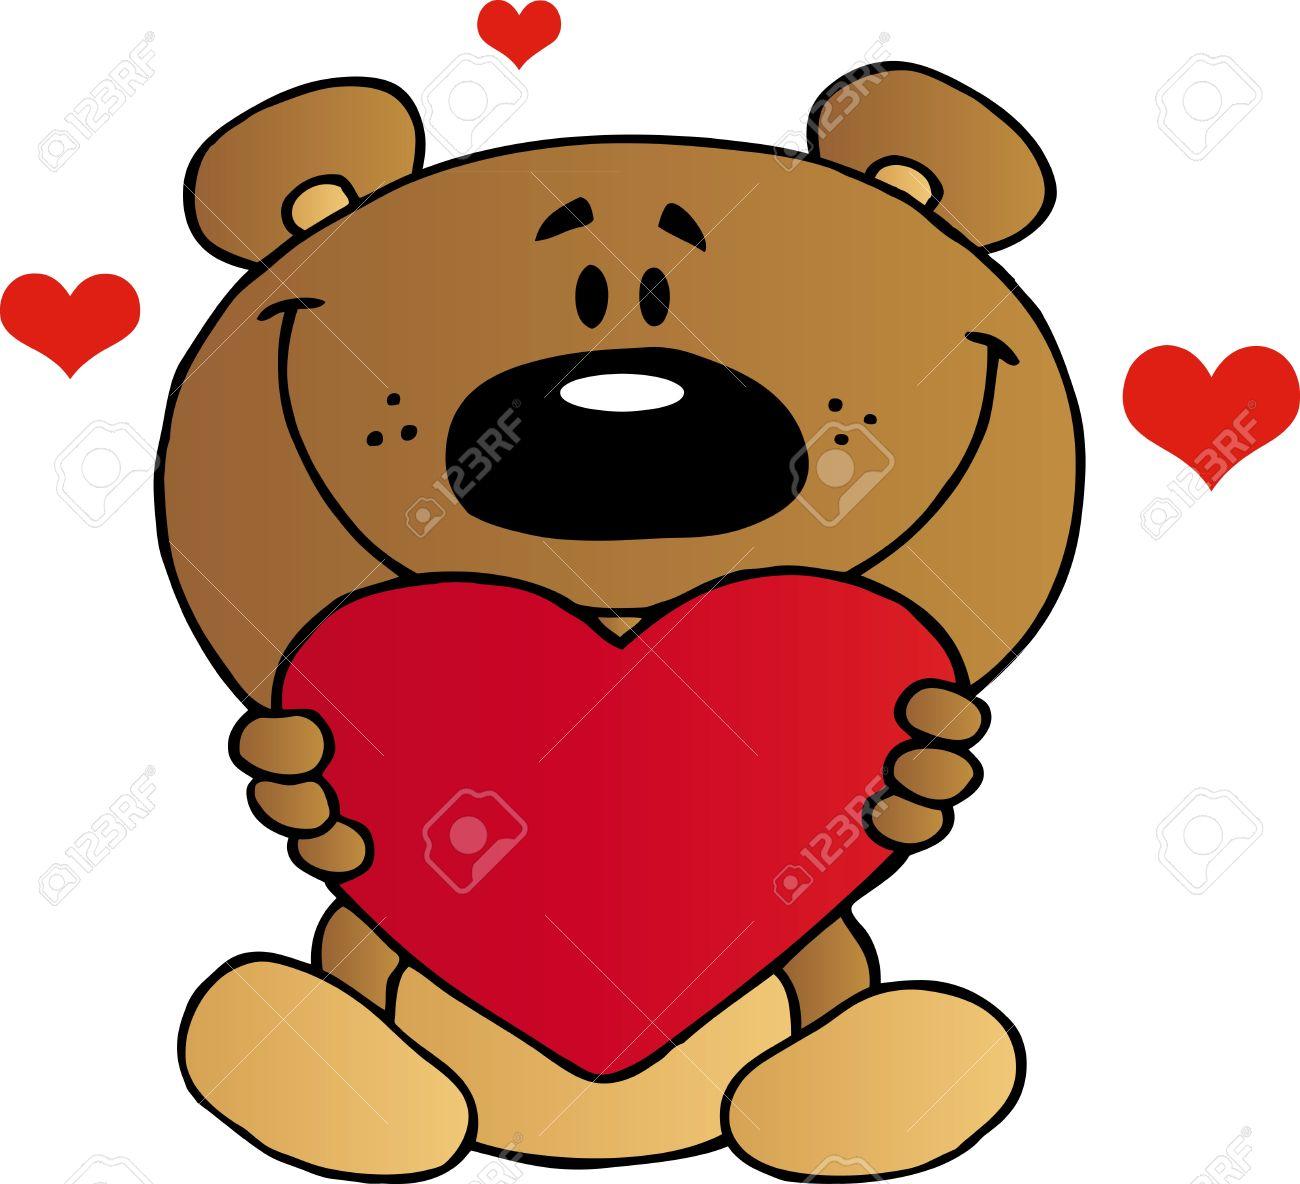 Teddy Bear Holding A Red Heart.